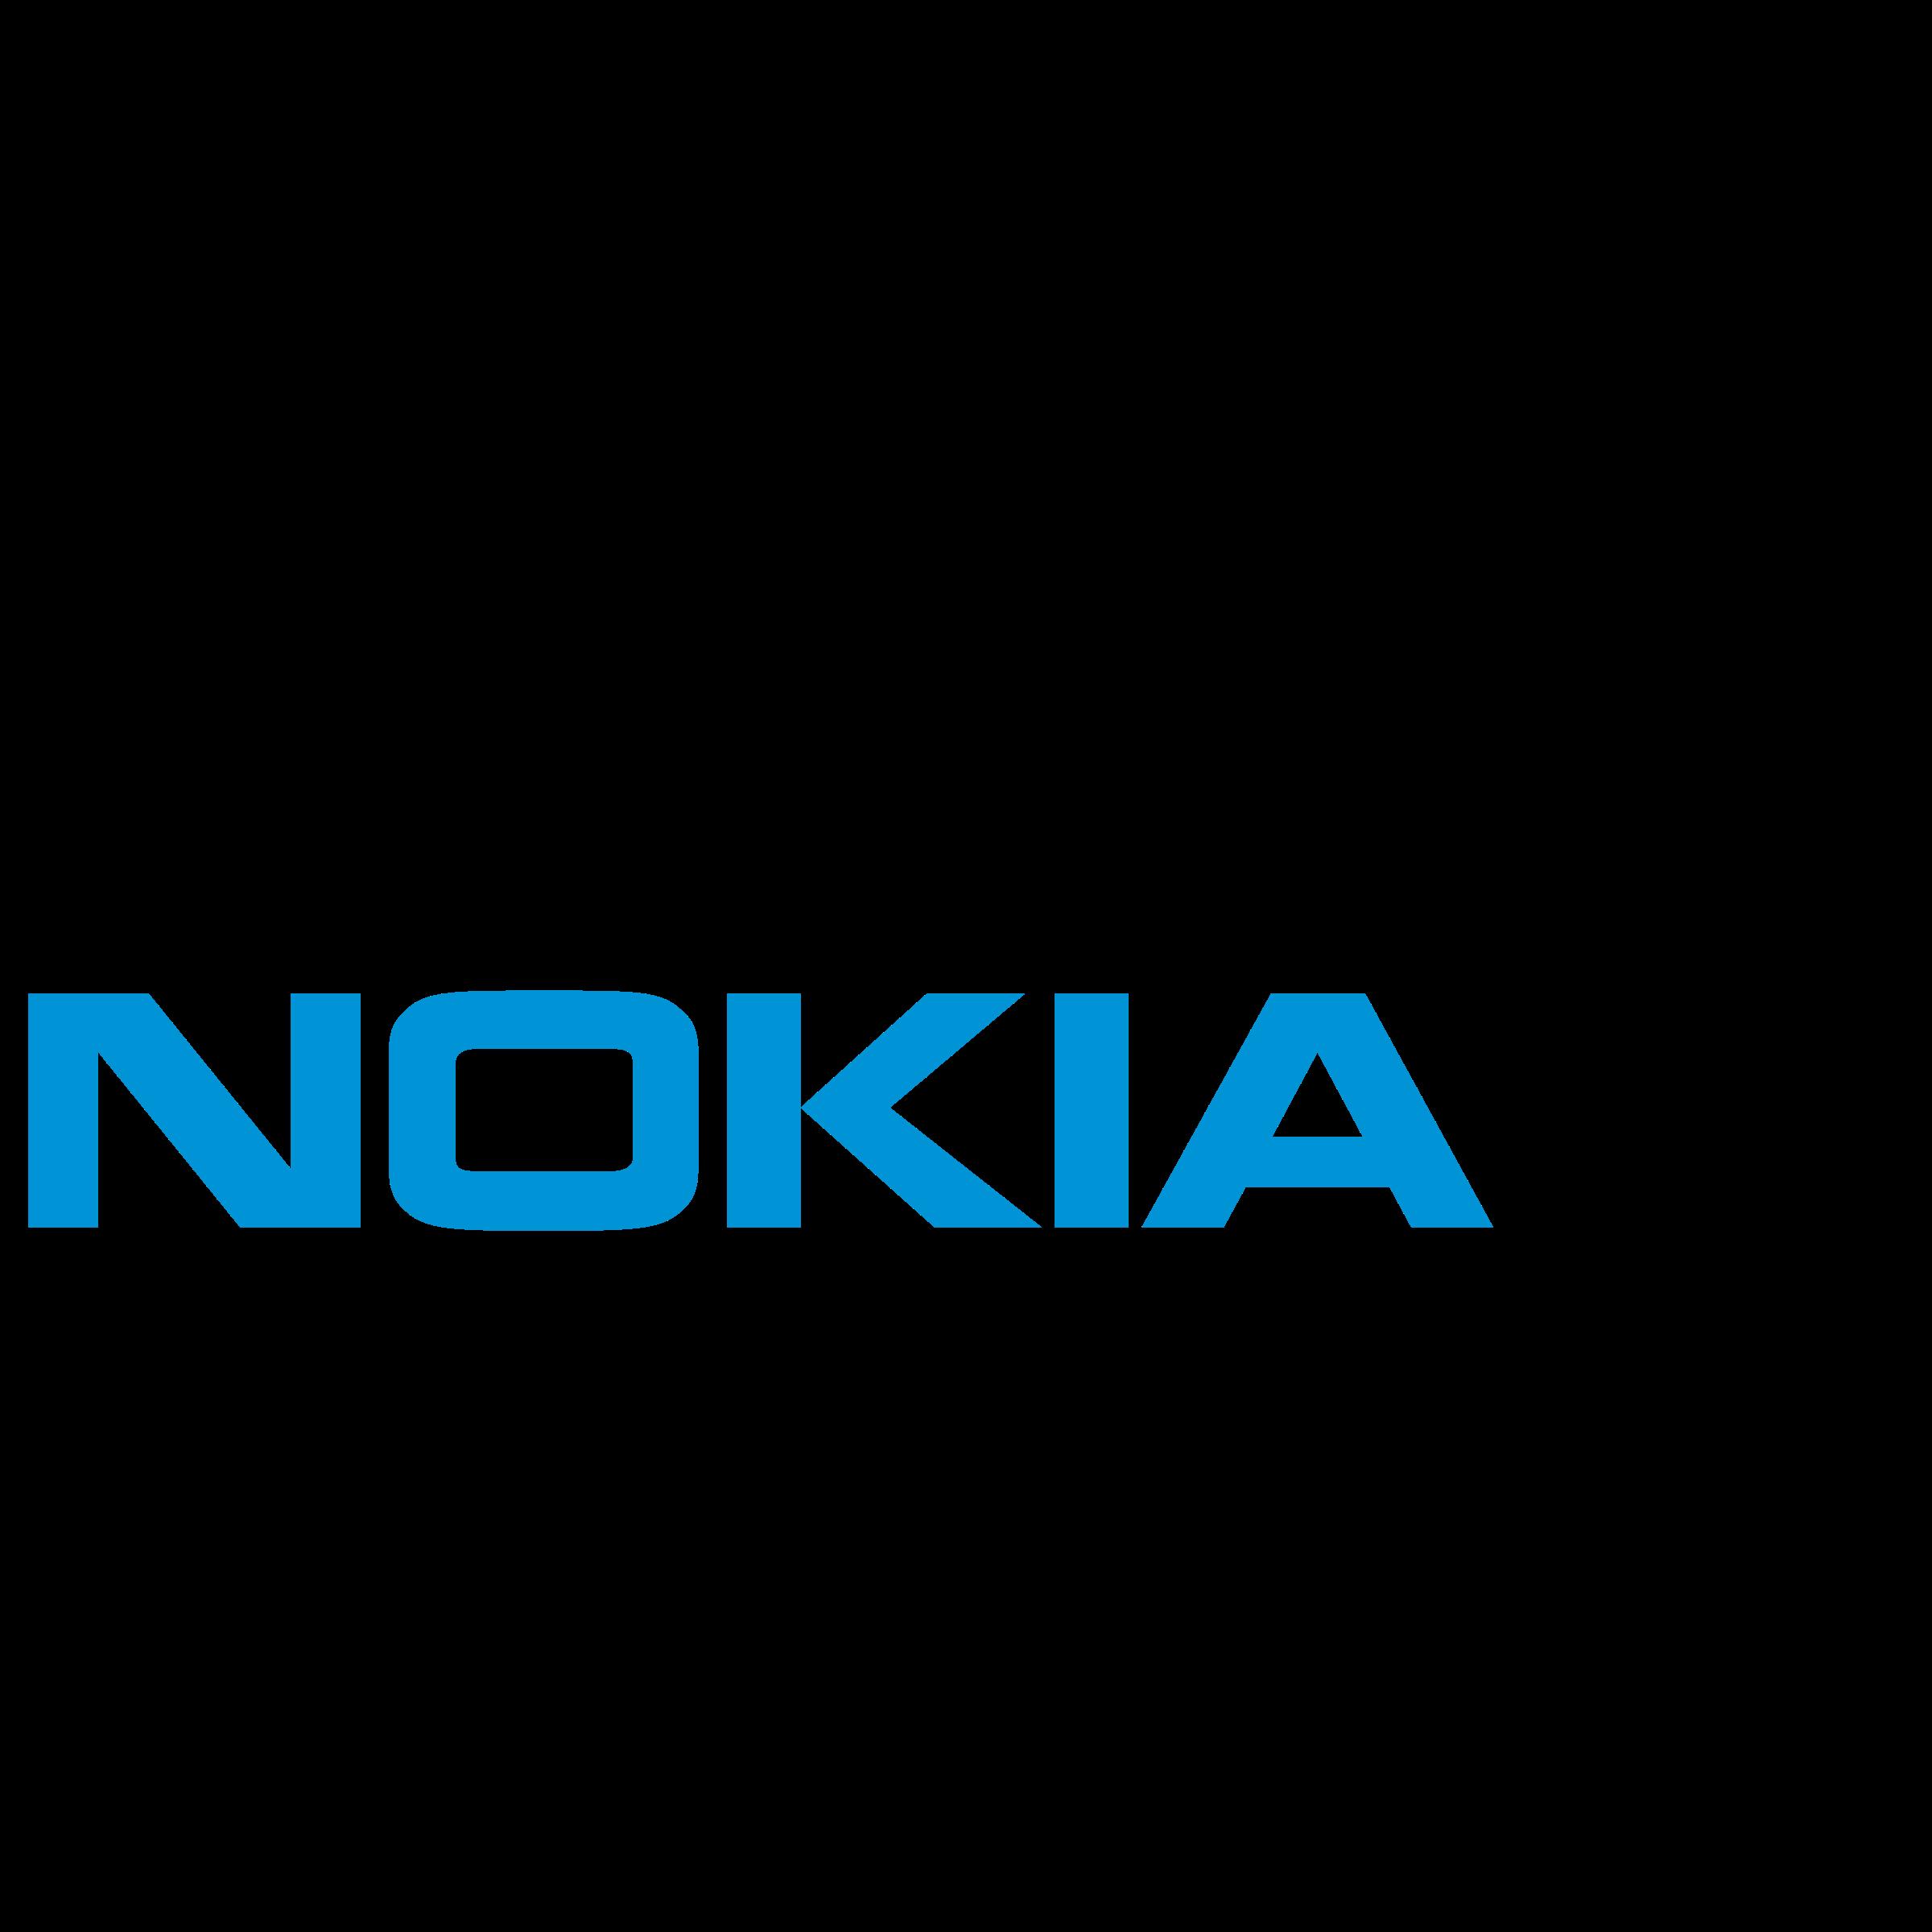 Nokia Logo PNG Transparent